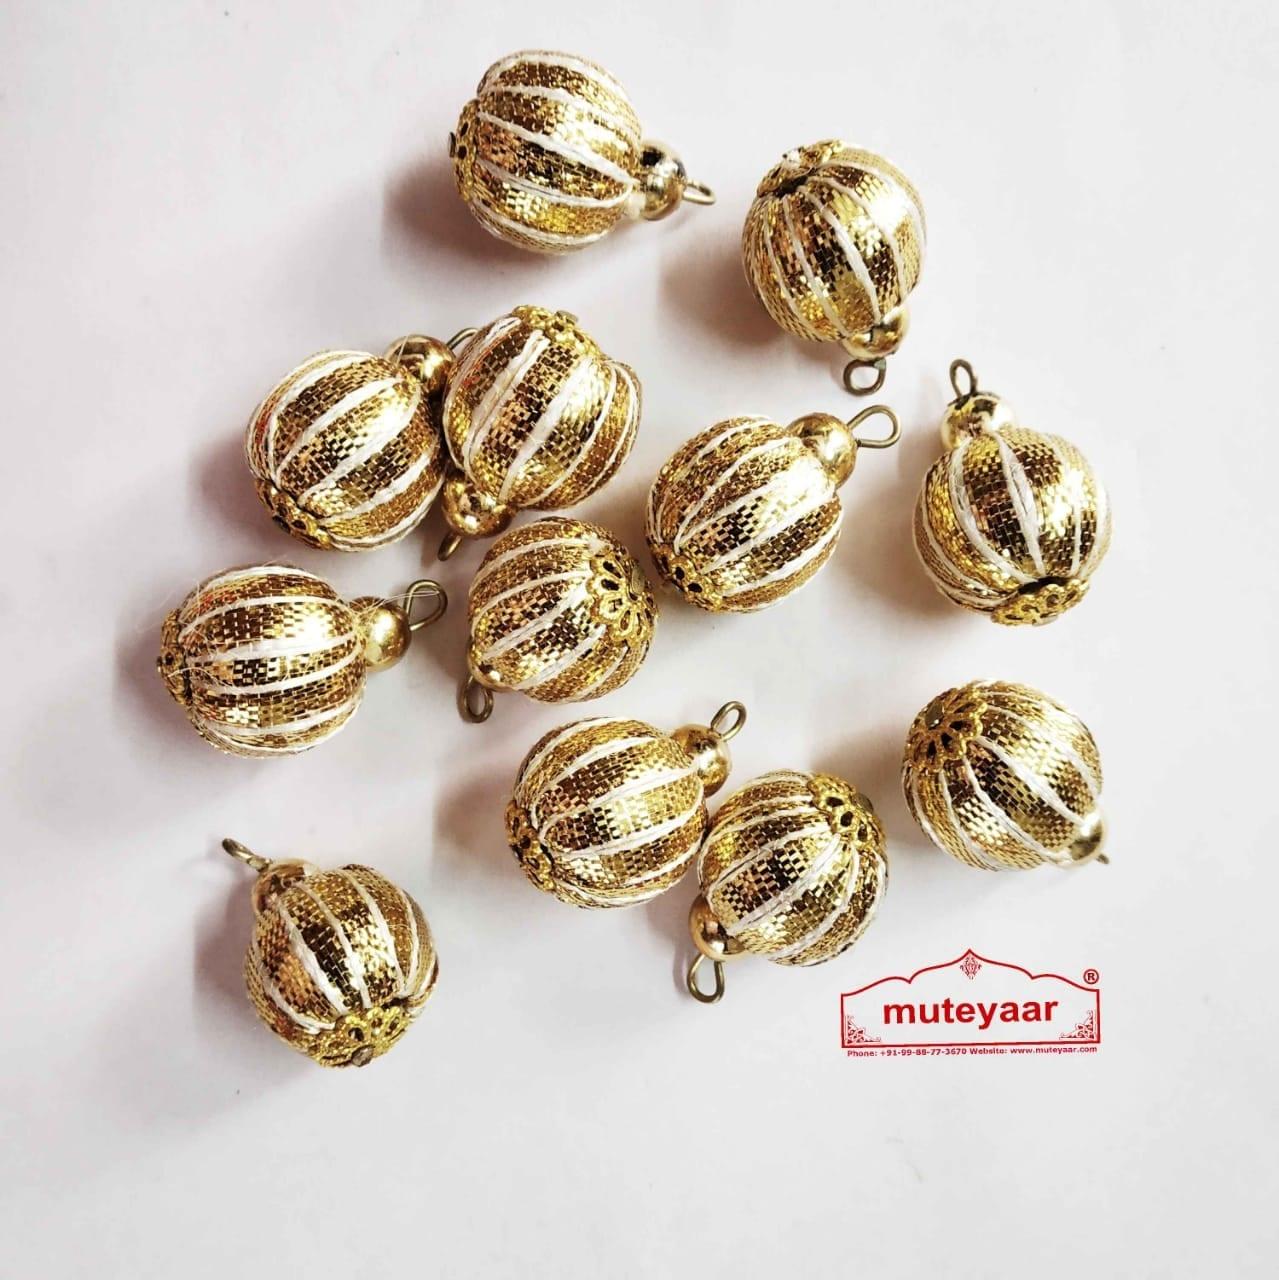 12 pieces Lot of Golden Ball Gota Patti Latkans Dangle Size 20 mm LK081 1